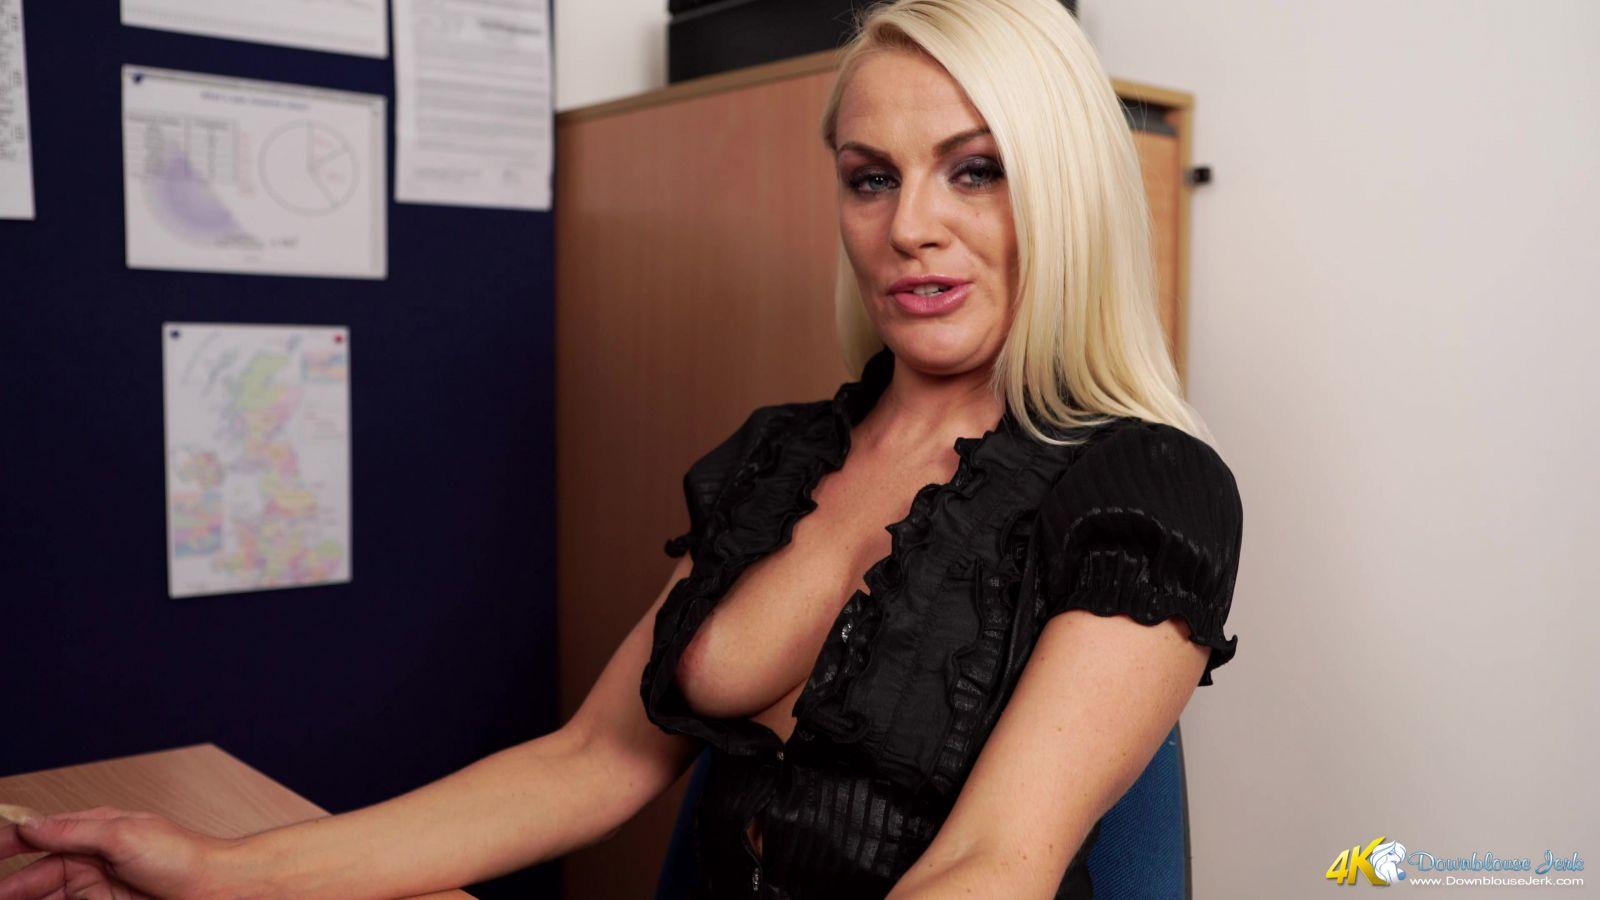 Fergie Commission Tits 112